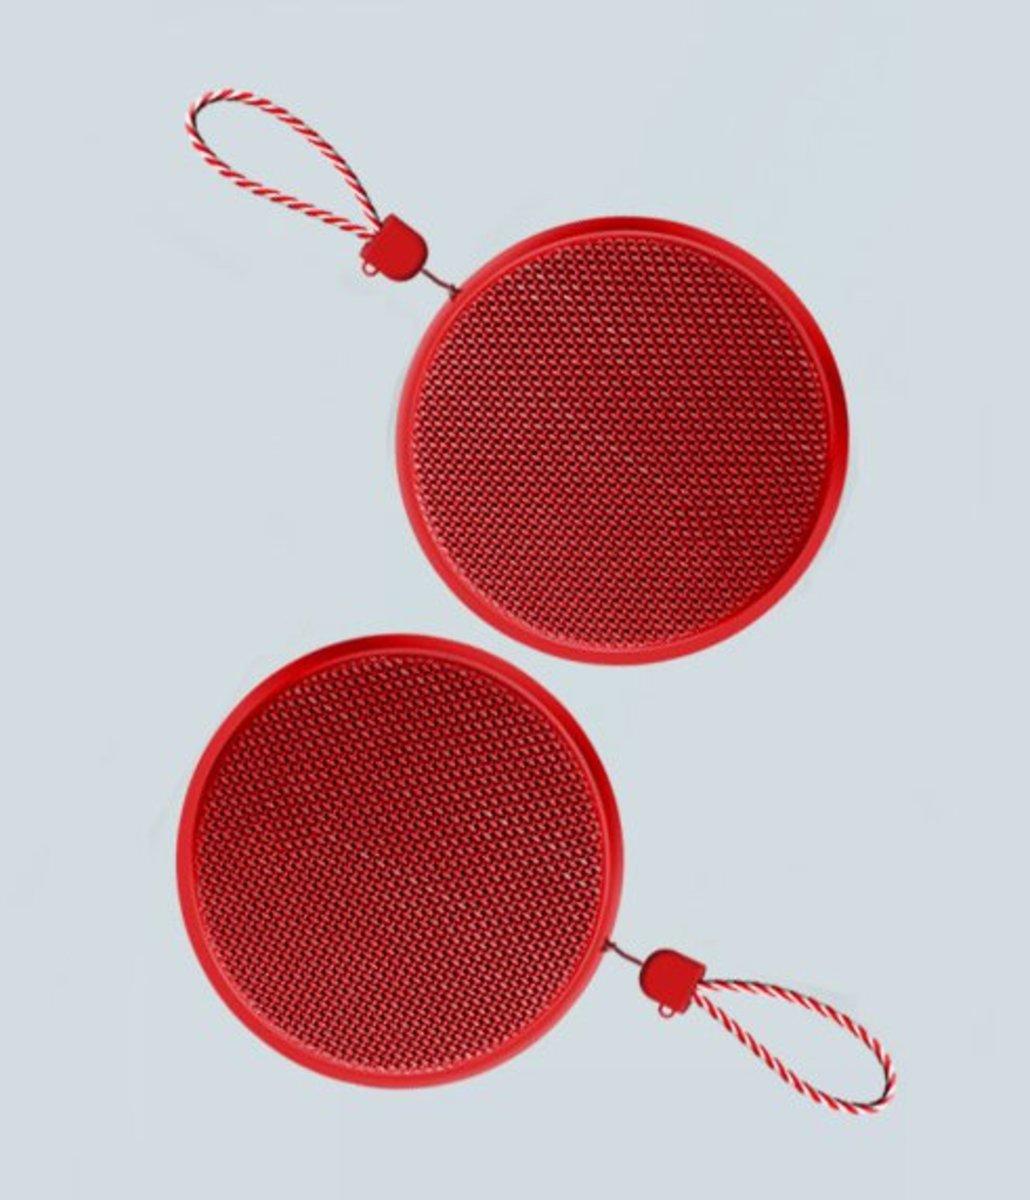 (Red) Mini Portable Hanging Wireless Bluetooth Speaker